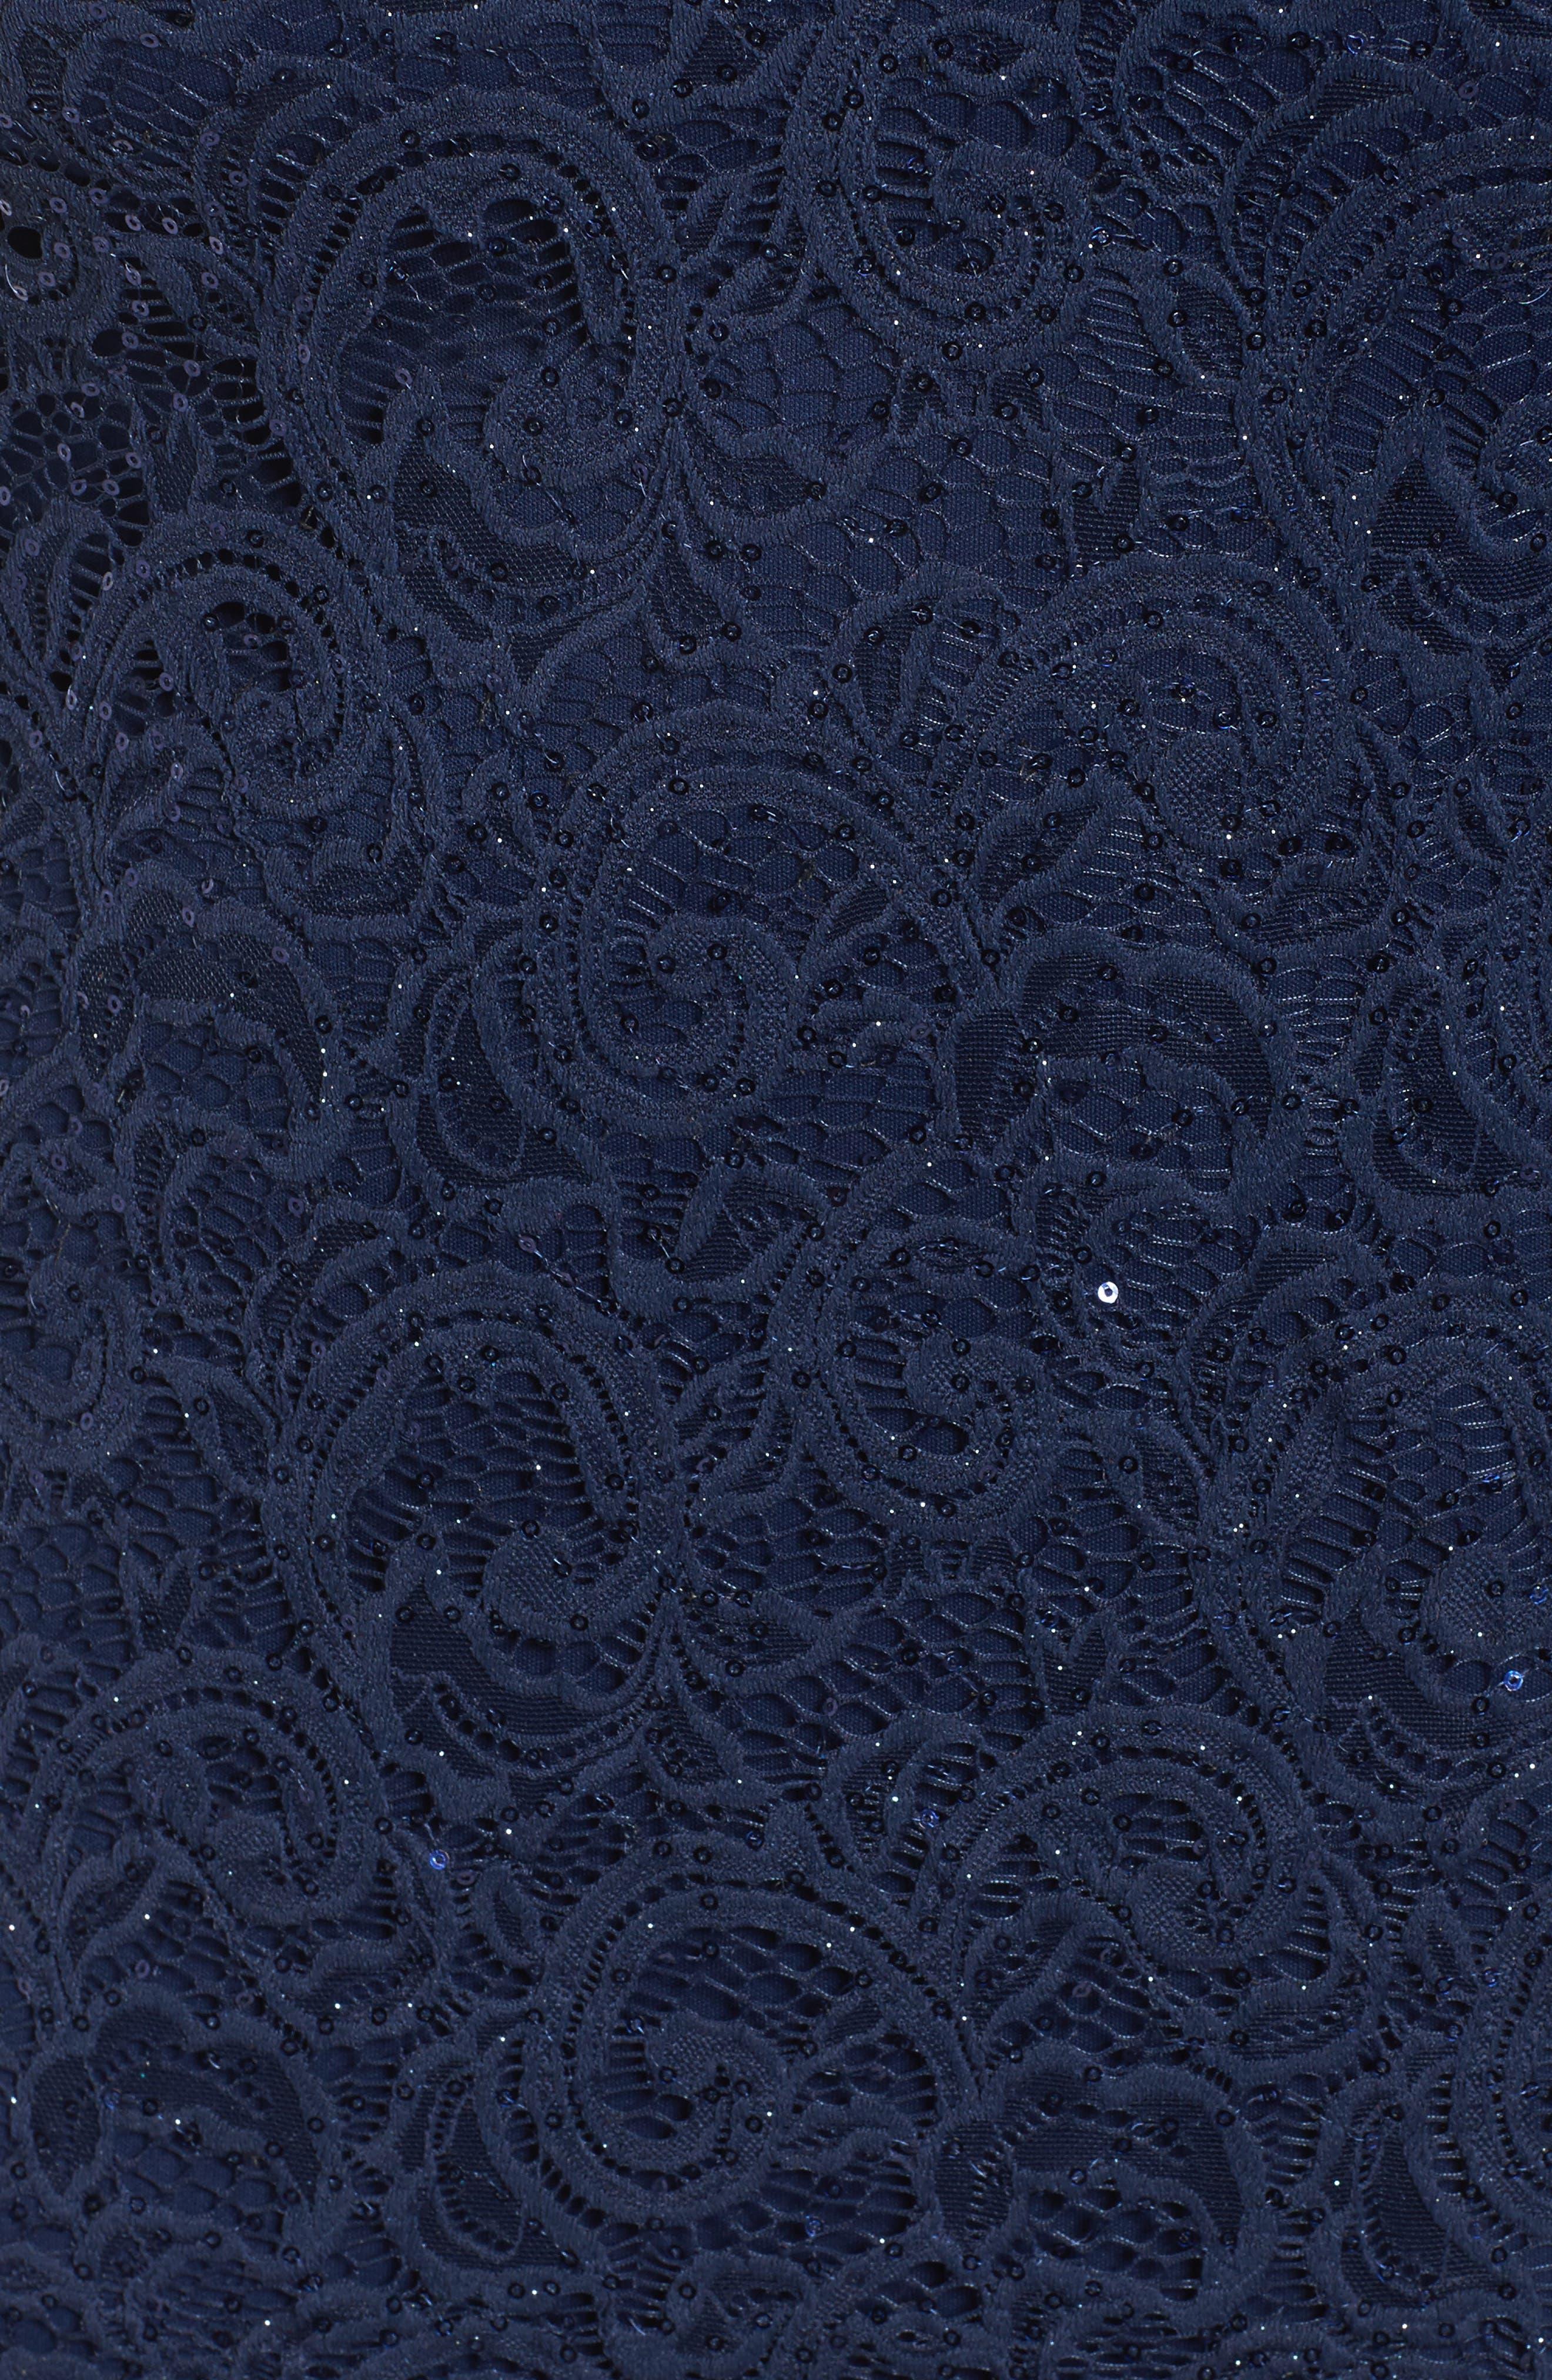 Sequin Keyhole Sheath Dress,                             Alternate thumbnail 5, color,                             Navy